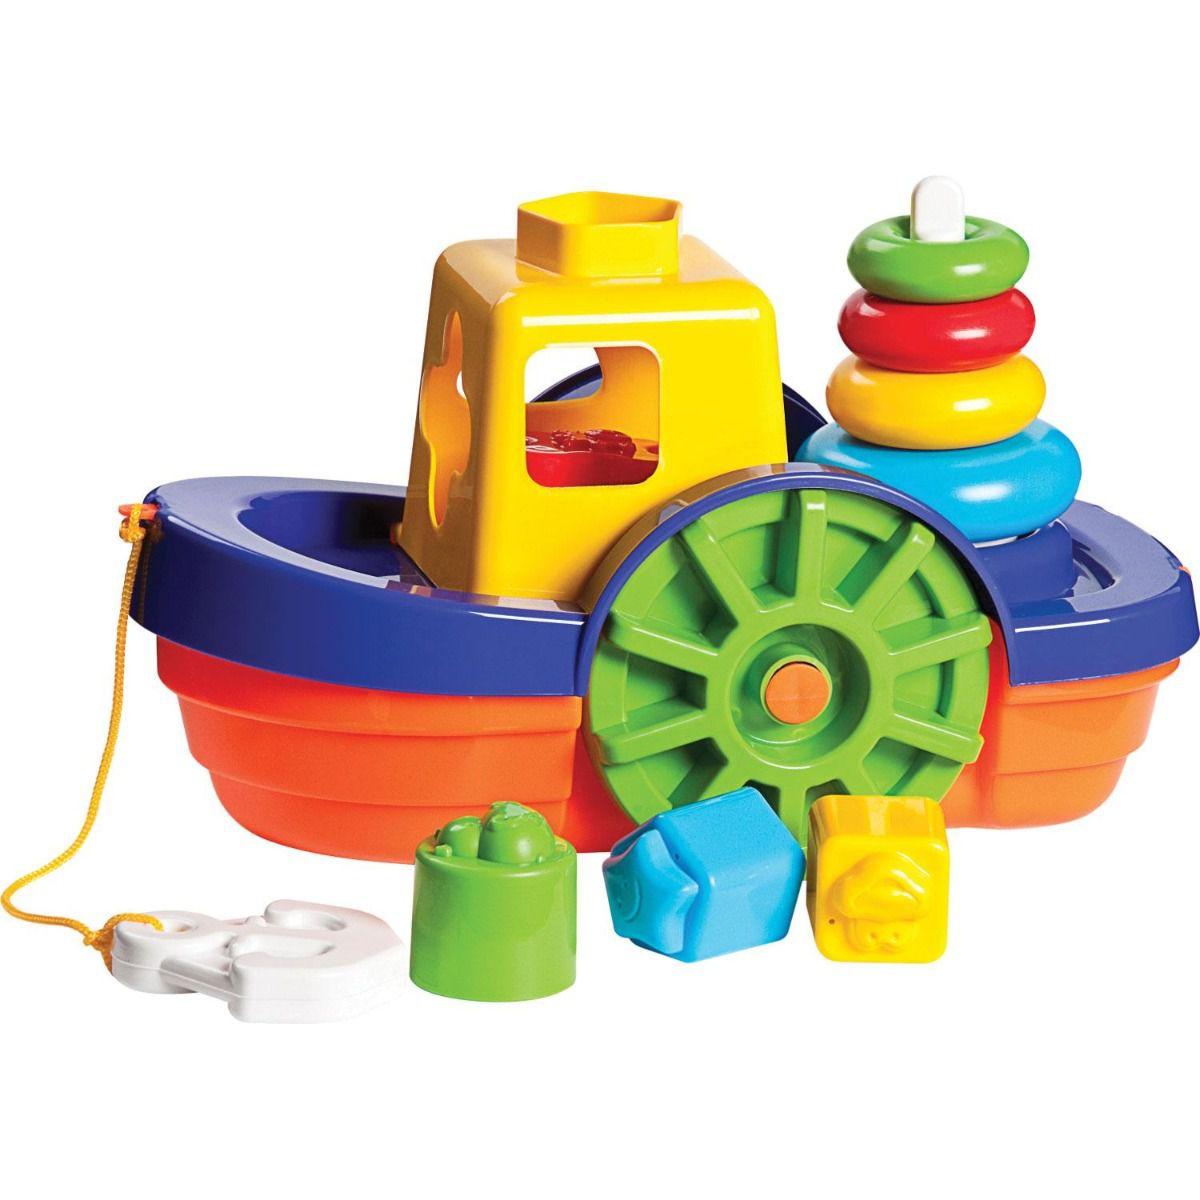 Brinquedo Educativo Barco Didático com Blocos MercoToys